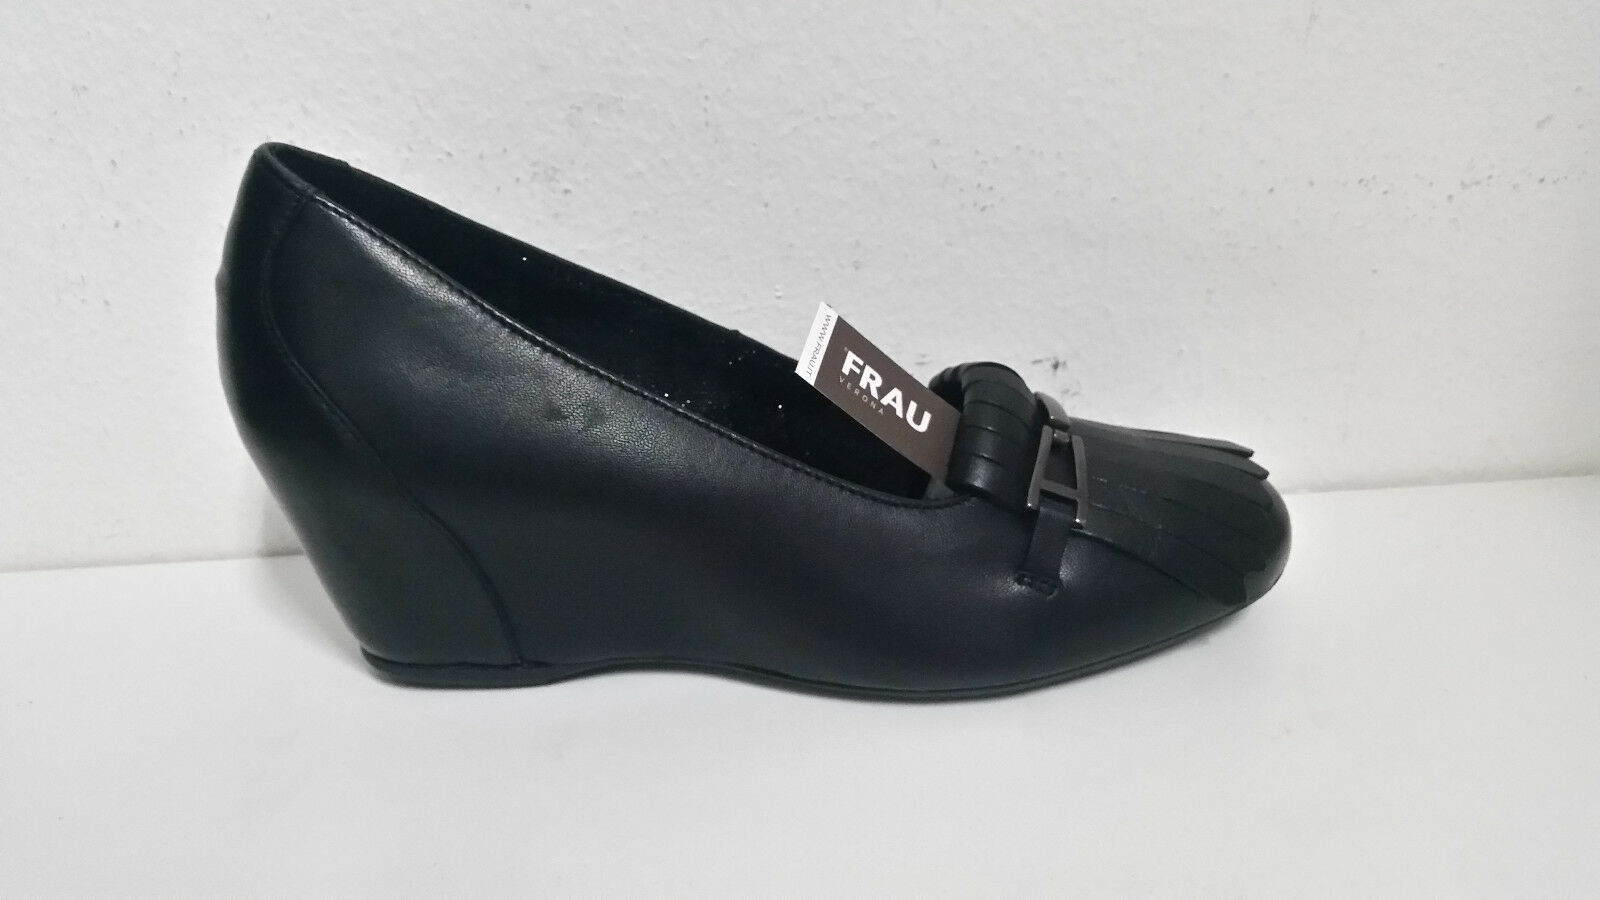 FRAU scarpe donna ballerine con zeppa n. 39 pelle nero art. 71P4